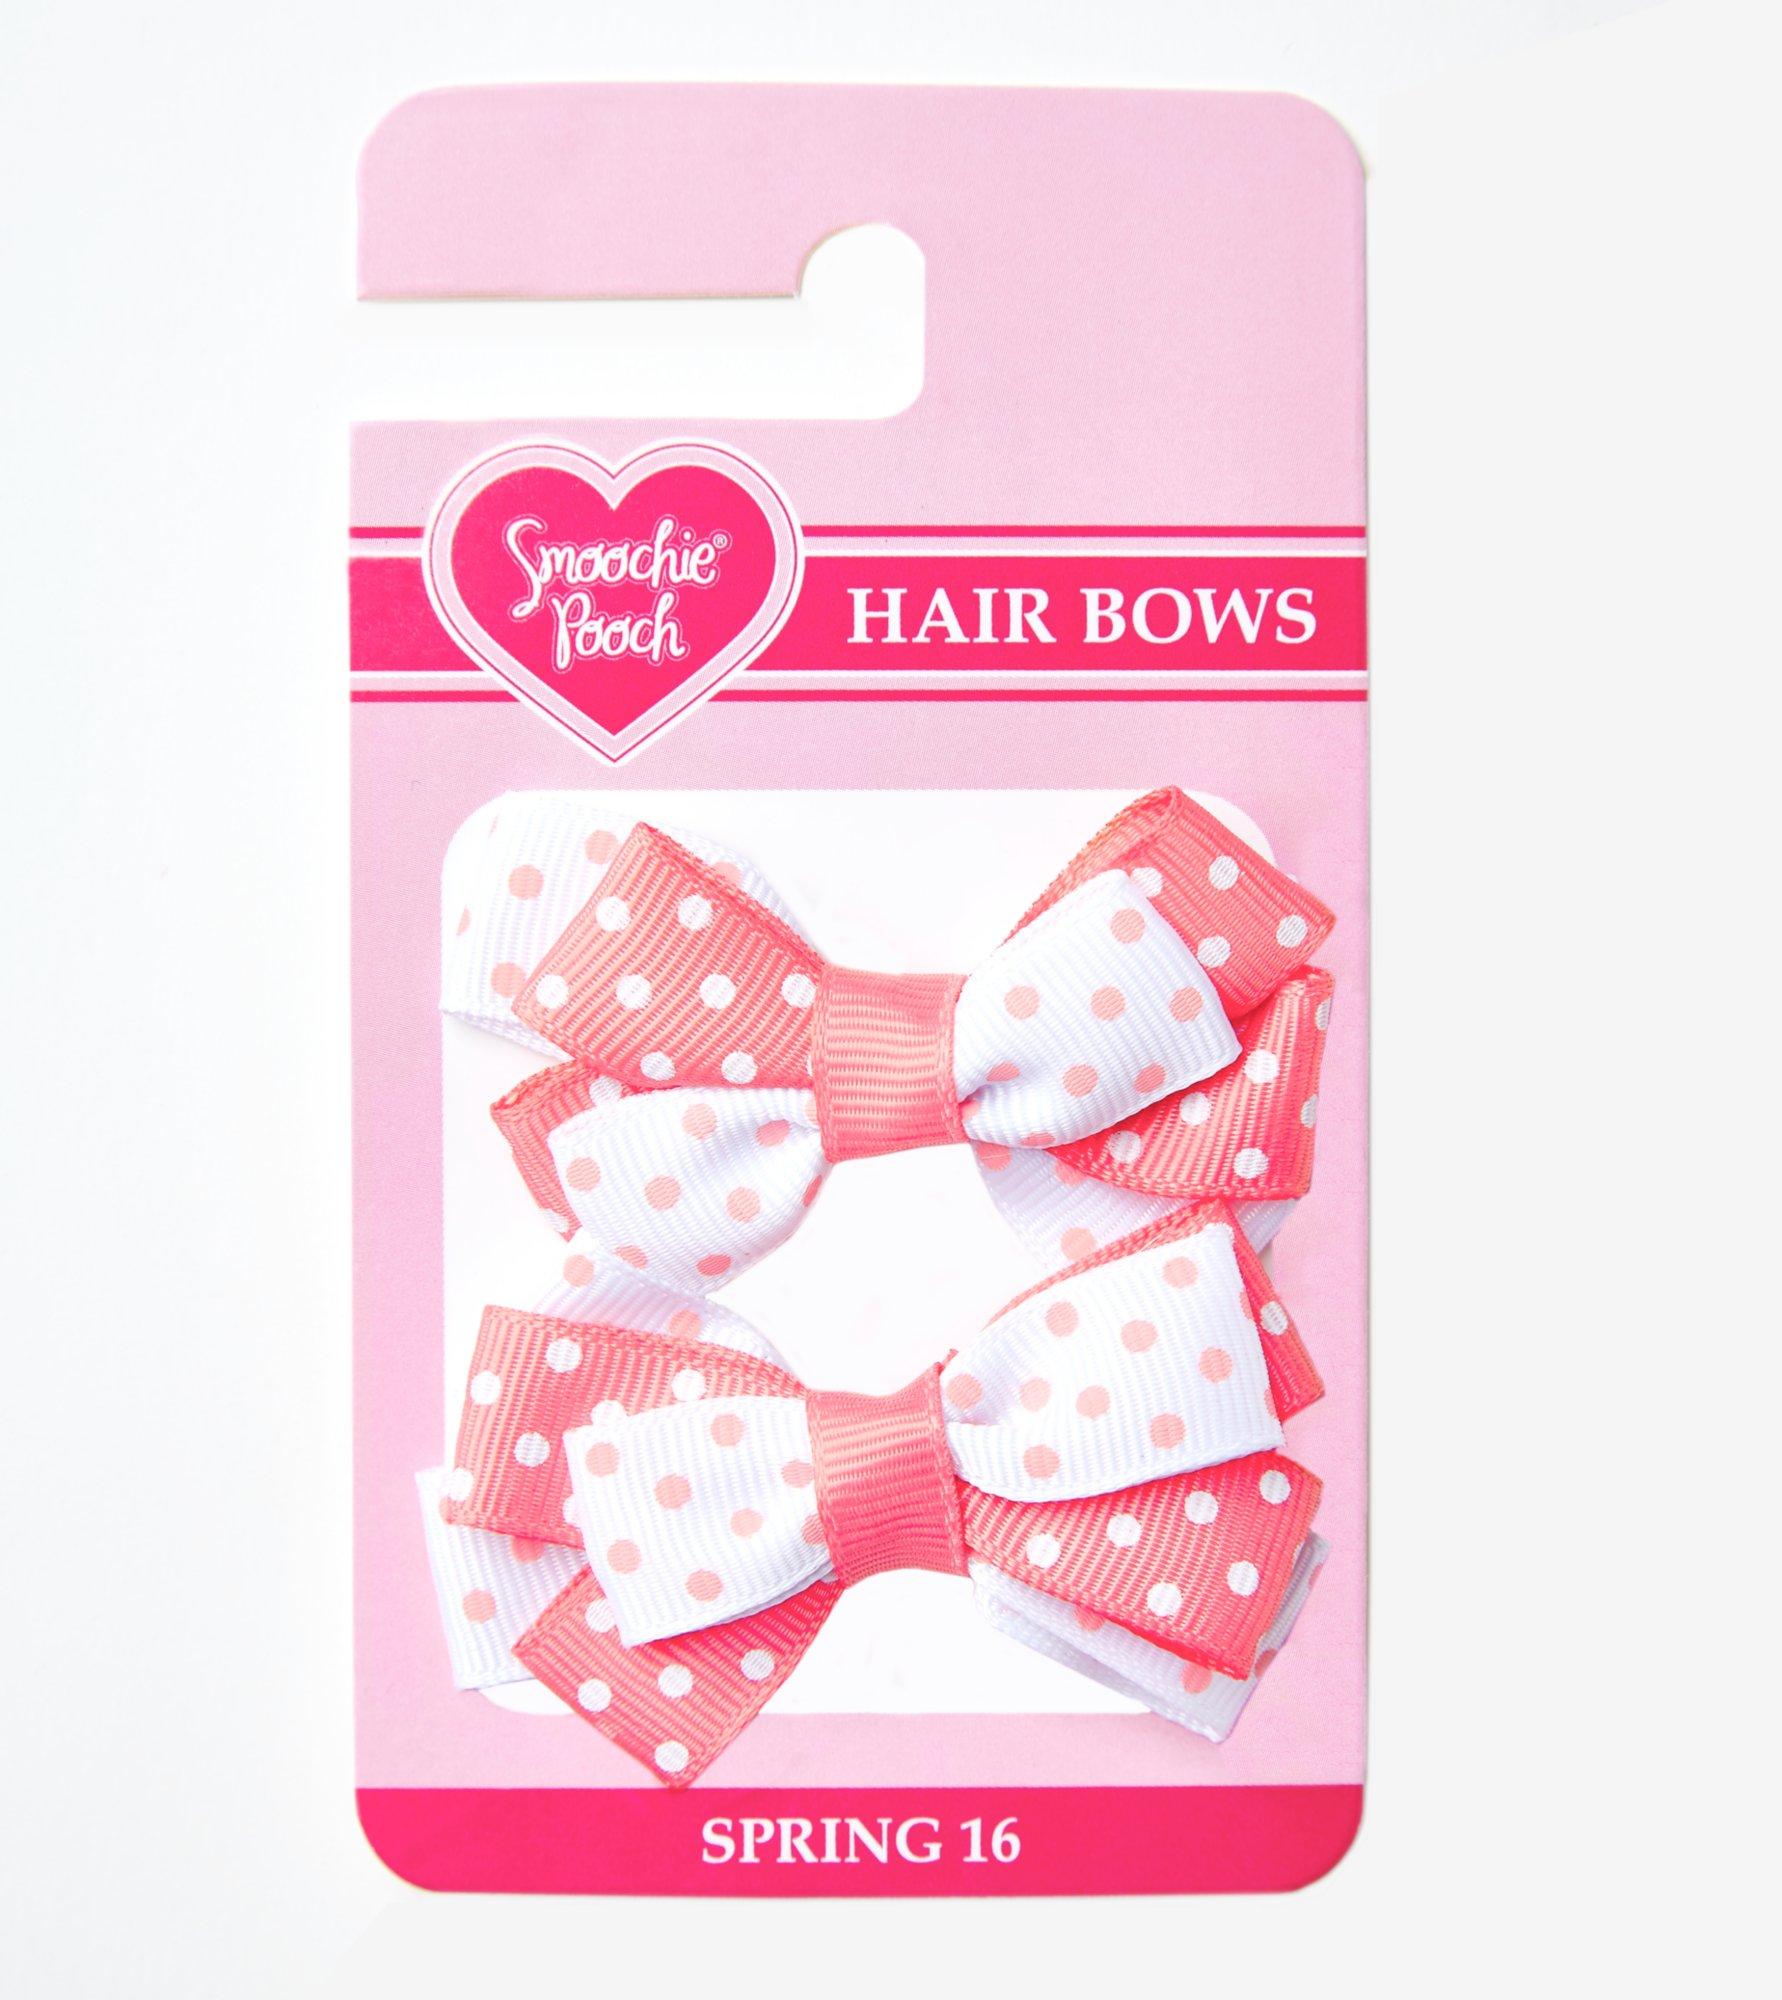 Smoochie Pooch Pink Loopy Bows